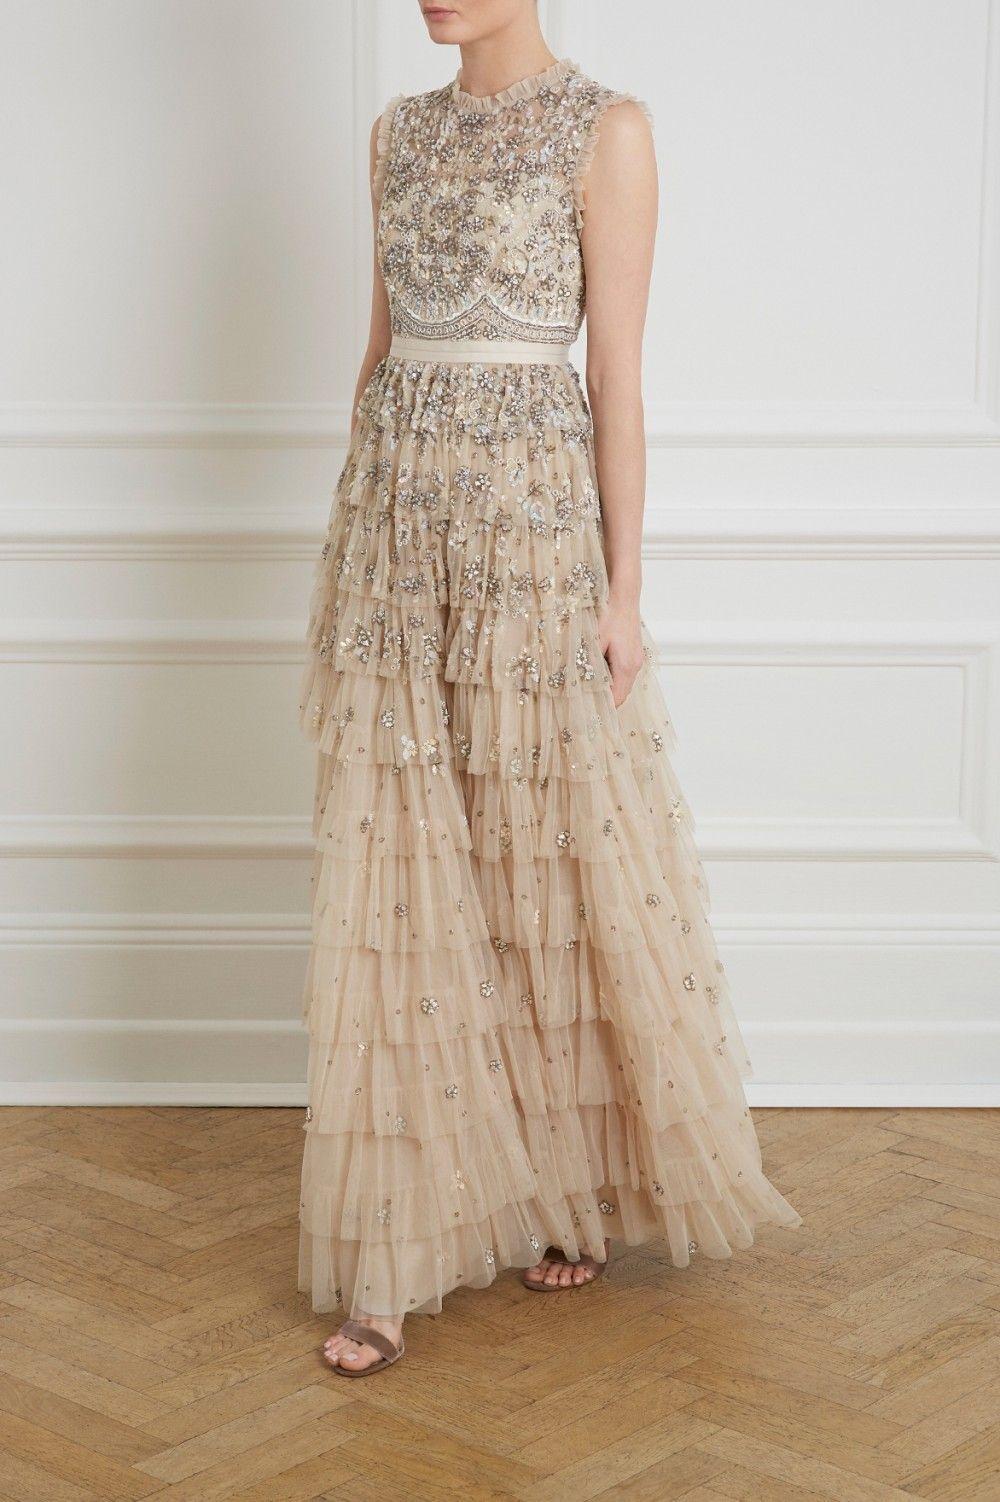 Needle u thread pearlescent gown boho bohemian ethereal ruffle